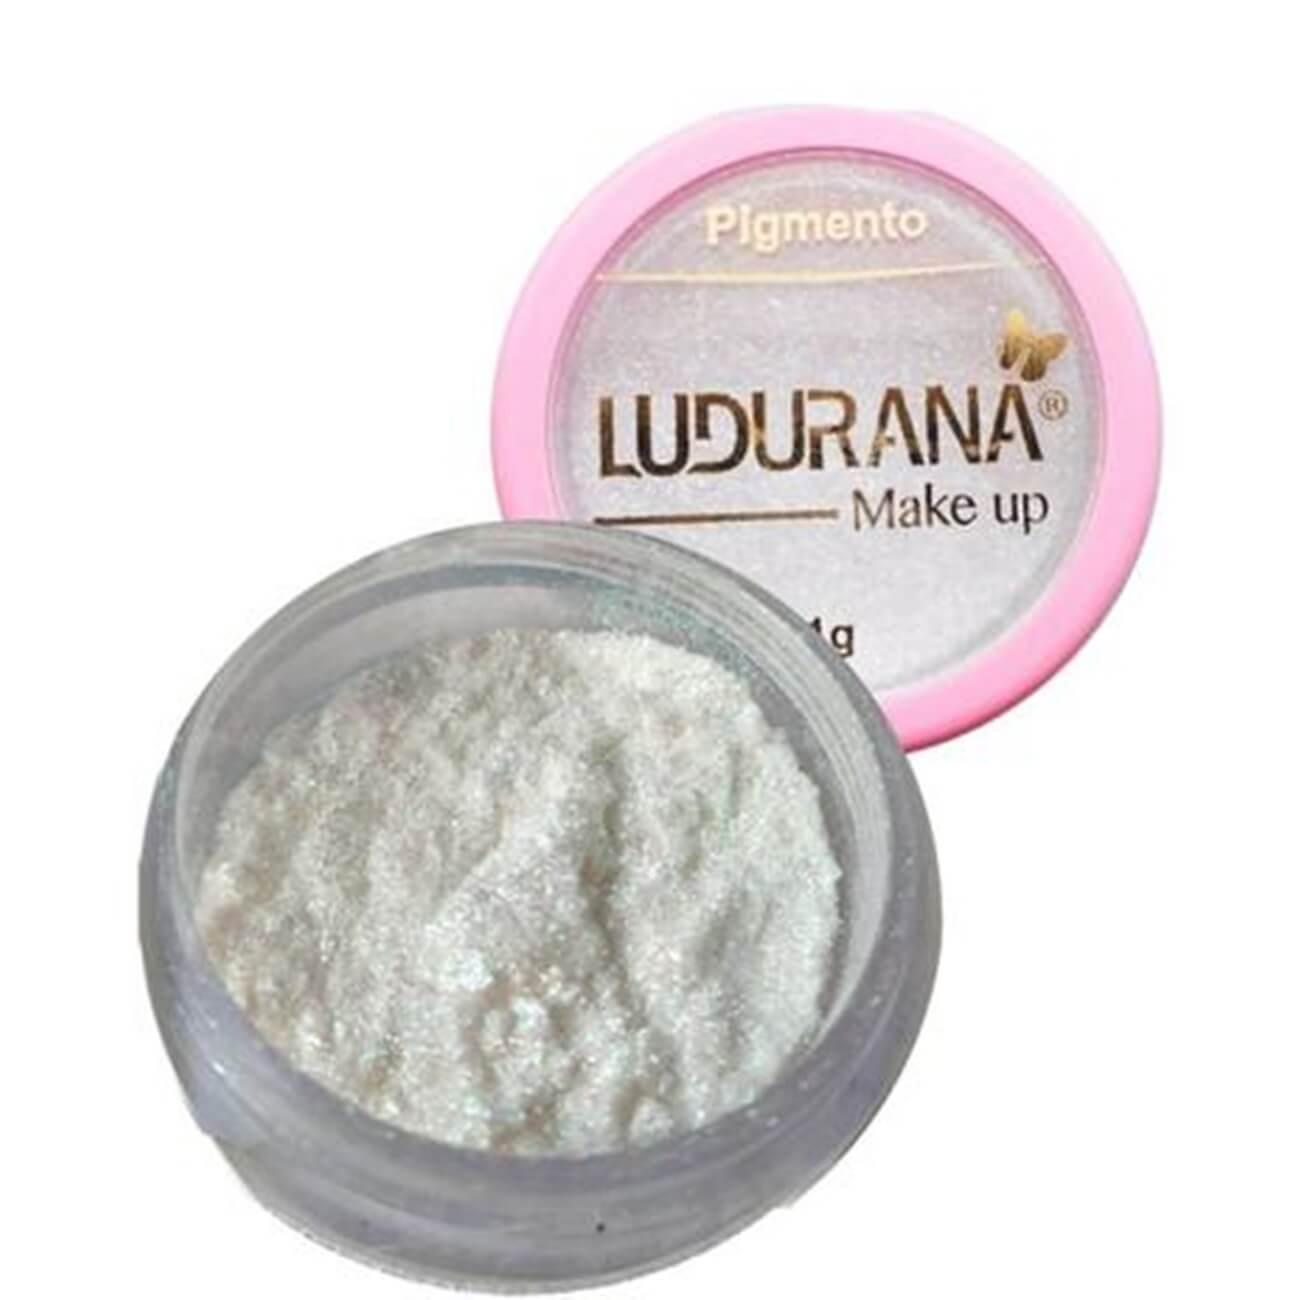 Pigmento - Ludurana Make Up